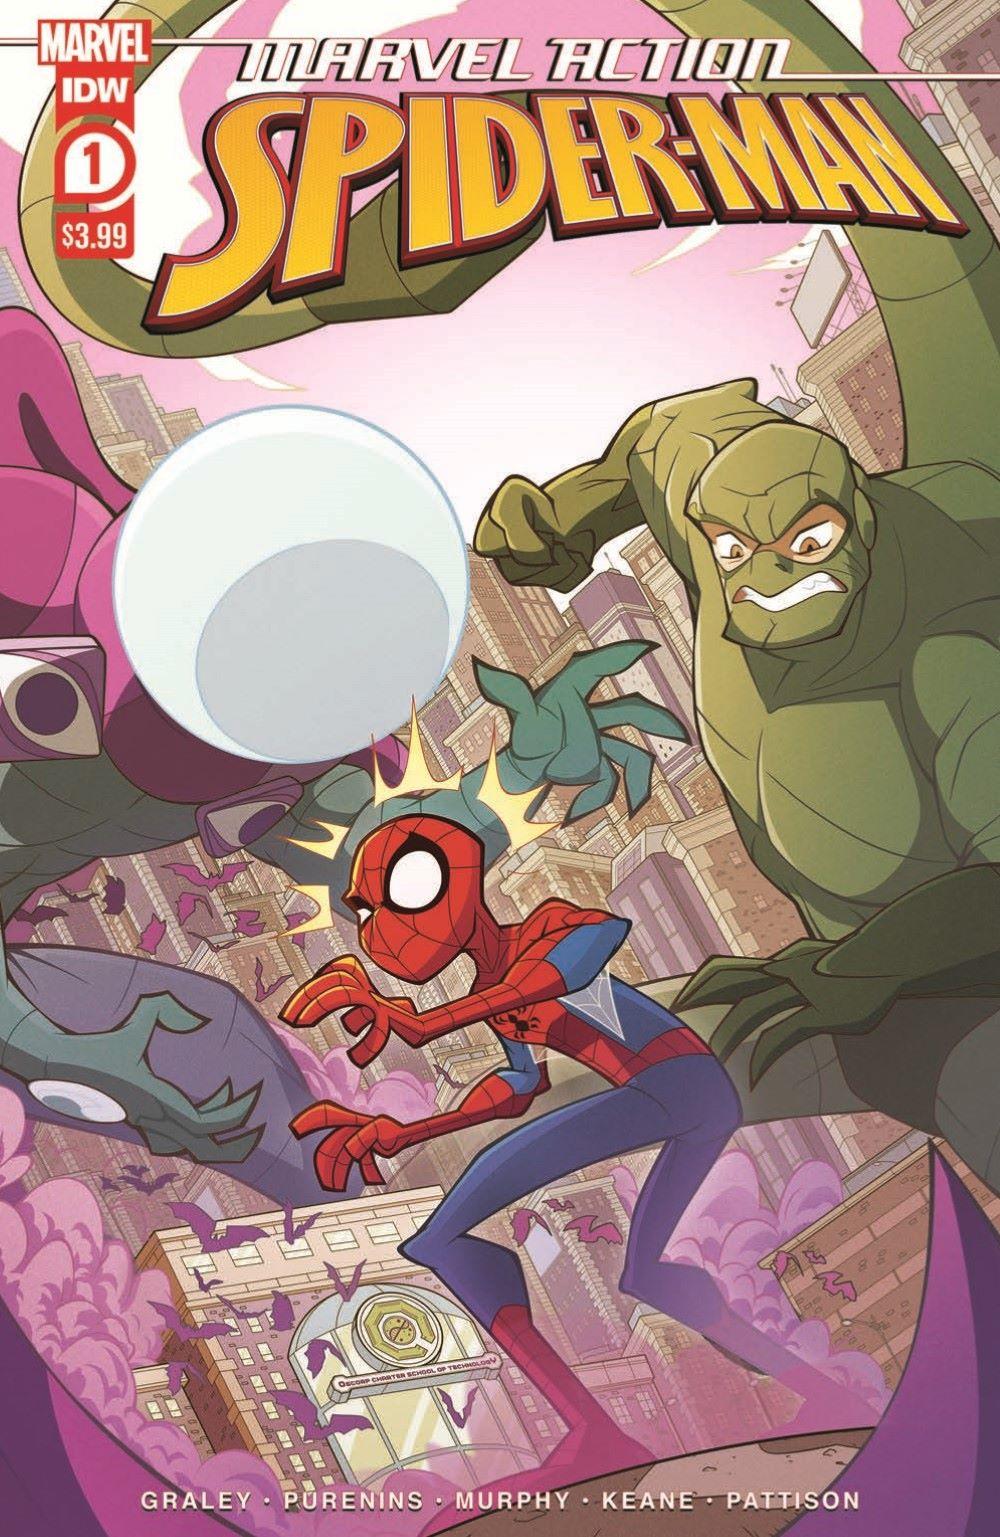 SpidermanV3-01_pr-1 ComicList Previews: MARVEL ACTION SPIDER-MAN VOLUME 3 #1